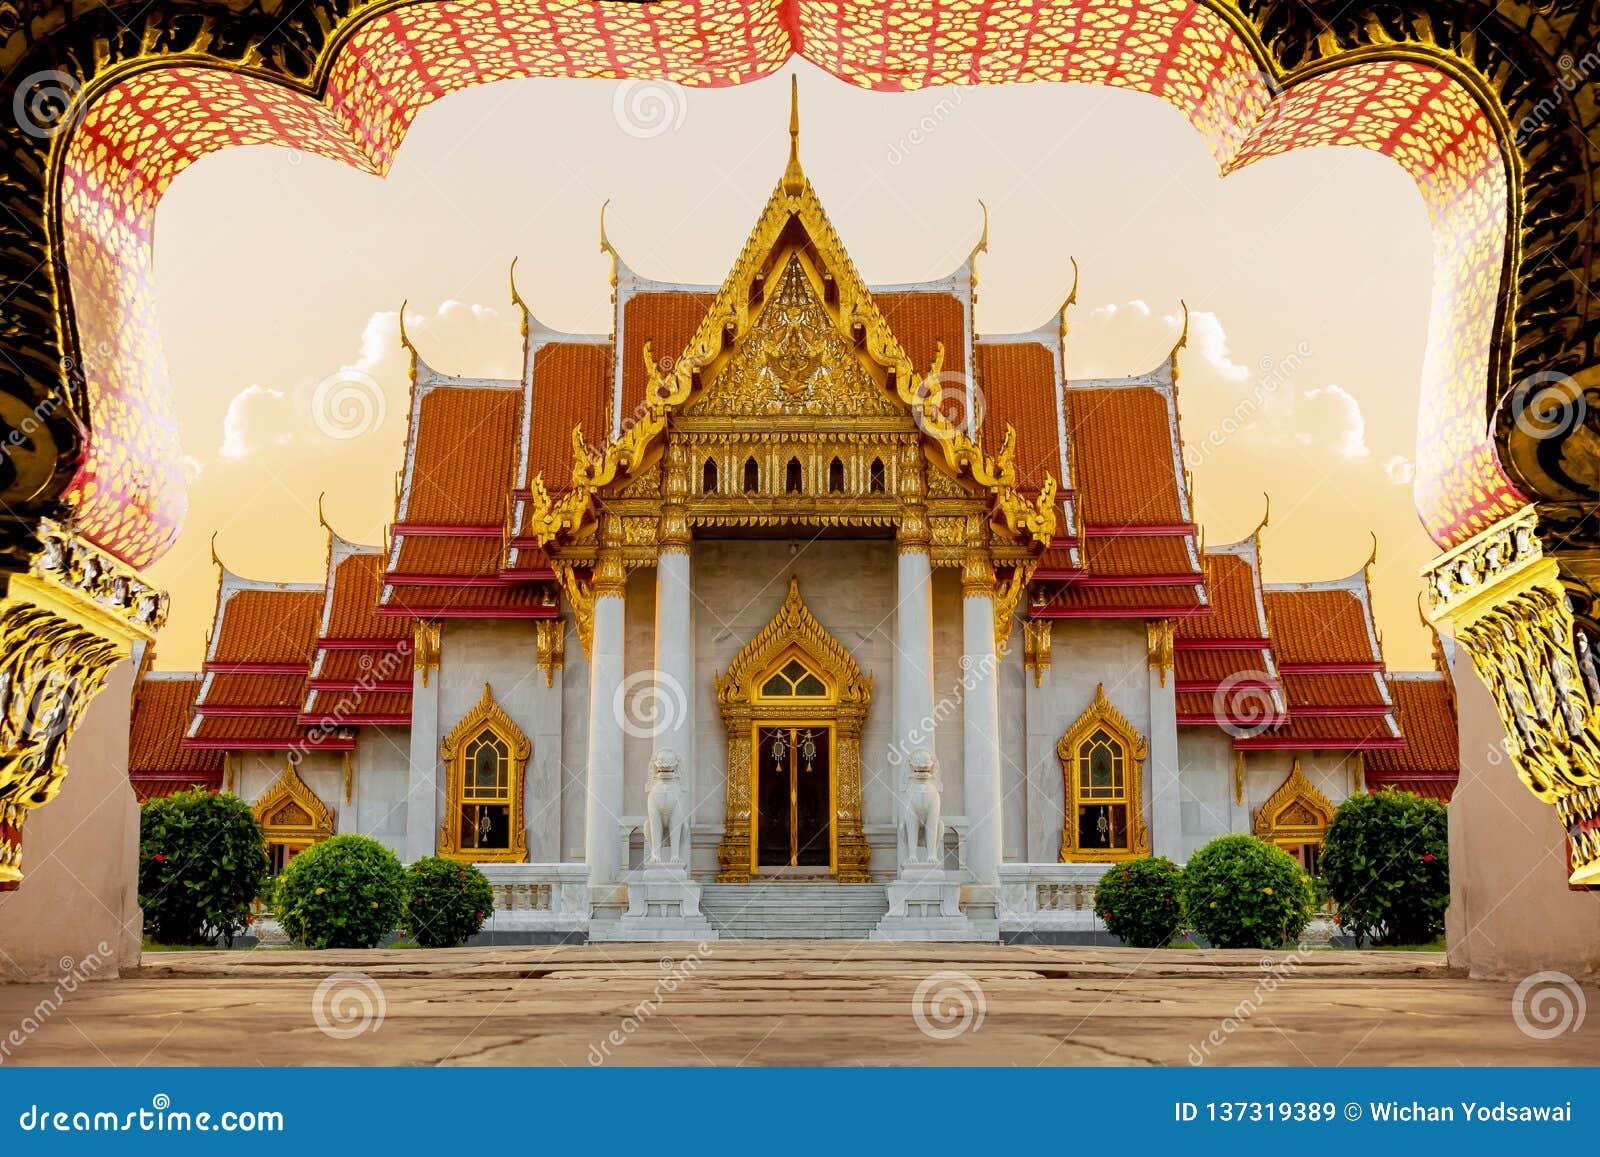 Самое лучшее виска мрамора туризма Wat Benchamabophit в Бангкоке Таиланде